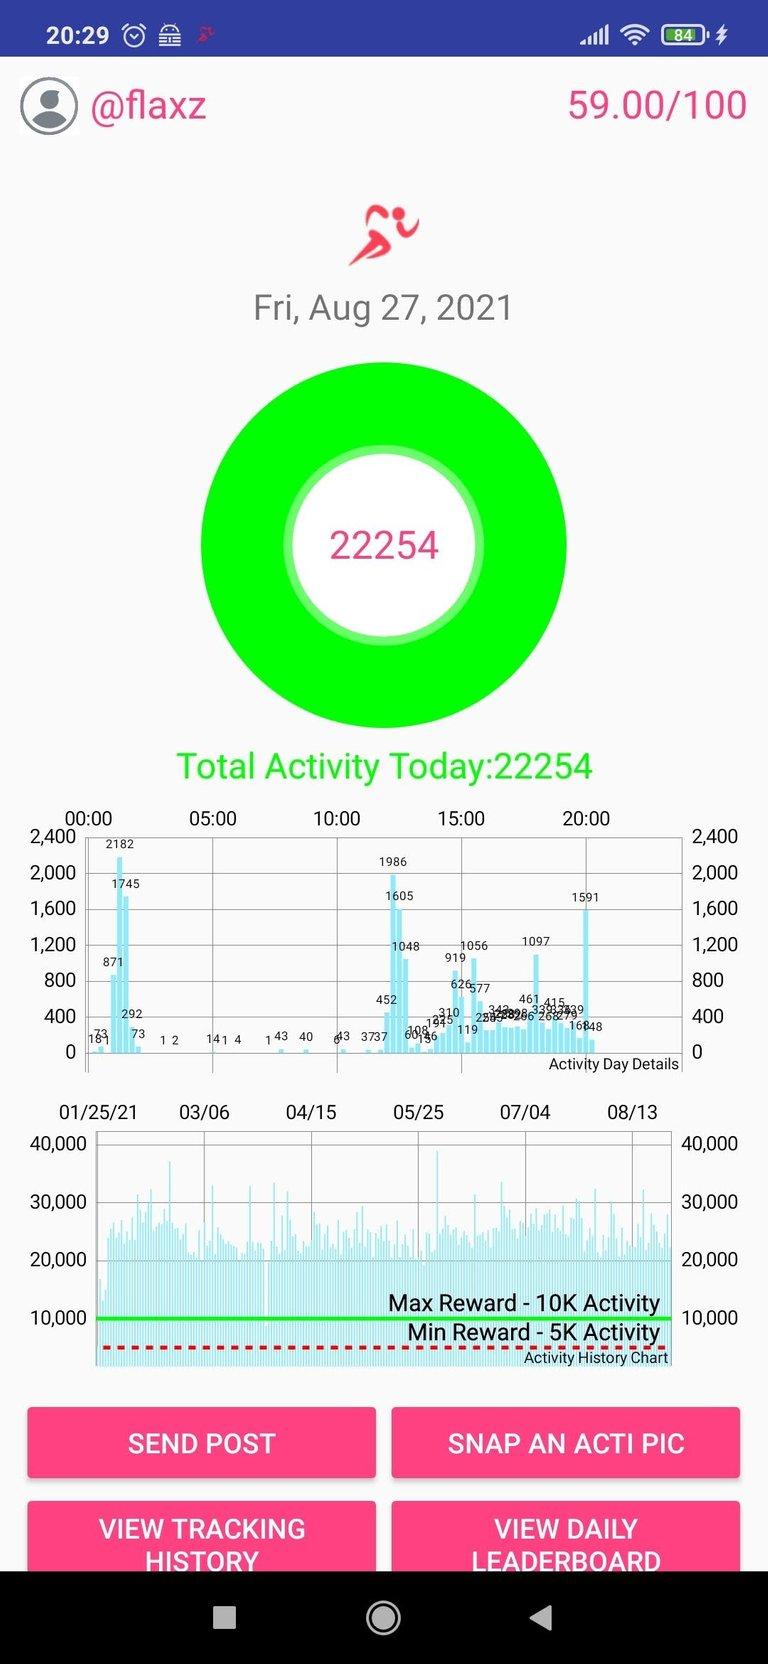 Screenshot_2021-08-27-20-29-23-144_io.actifit.fitnesstracker.actifitfitnesstracker.jpg